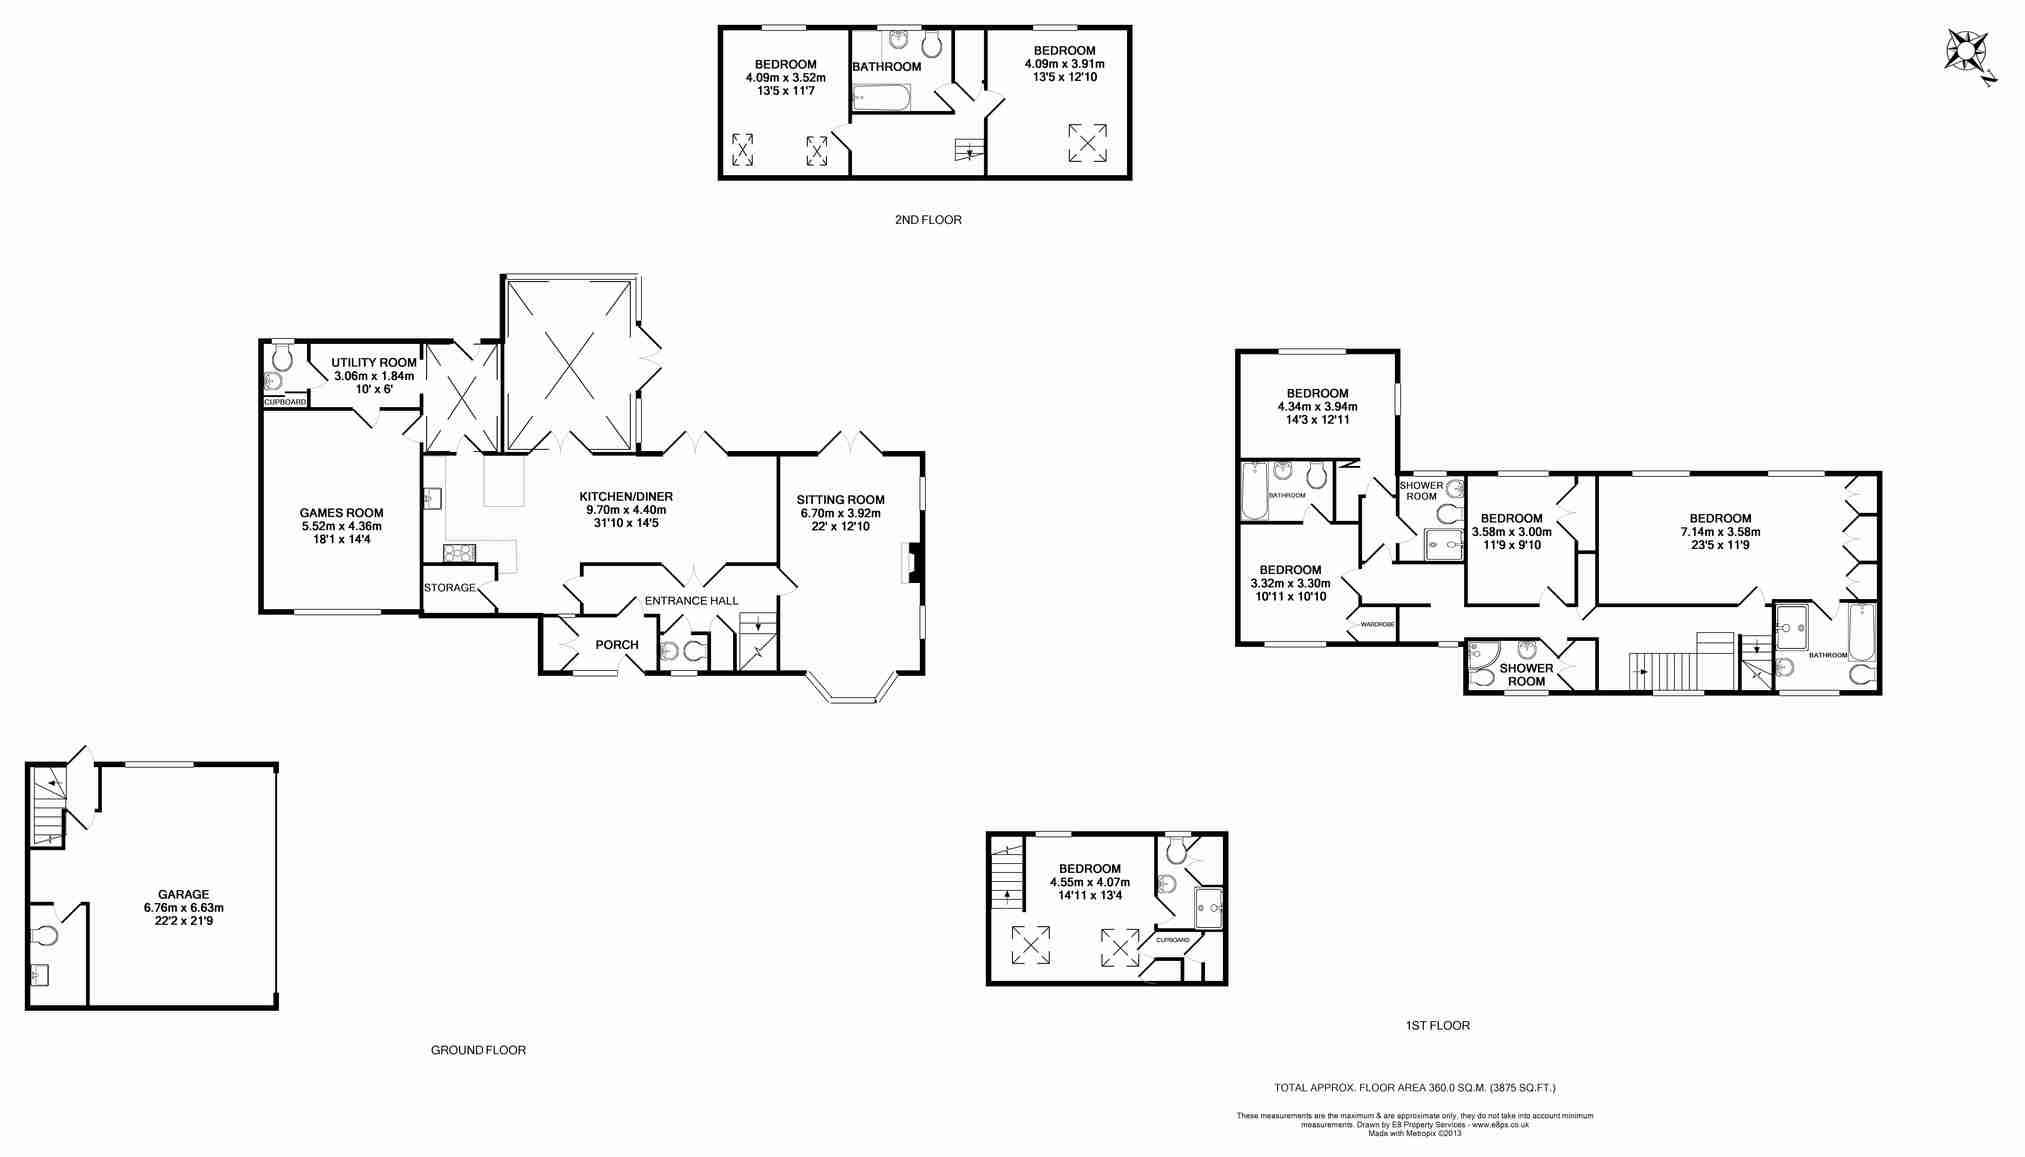 Vernon Avenue Oxford Ox2 6 Bedroom Property To Rent 41428933 Primelocation